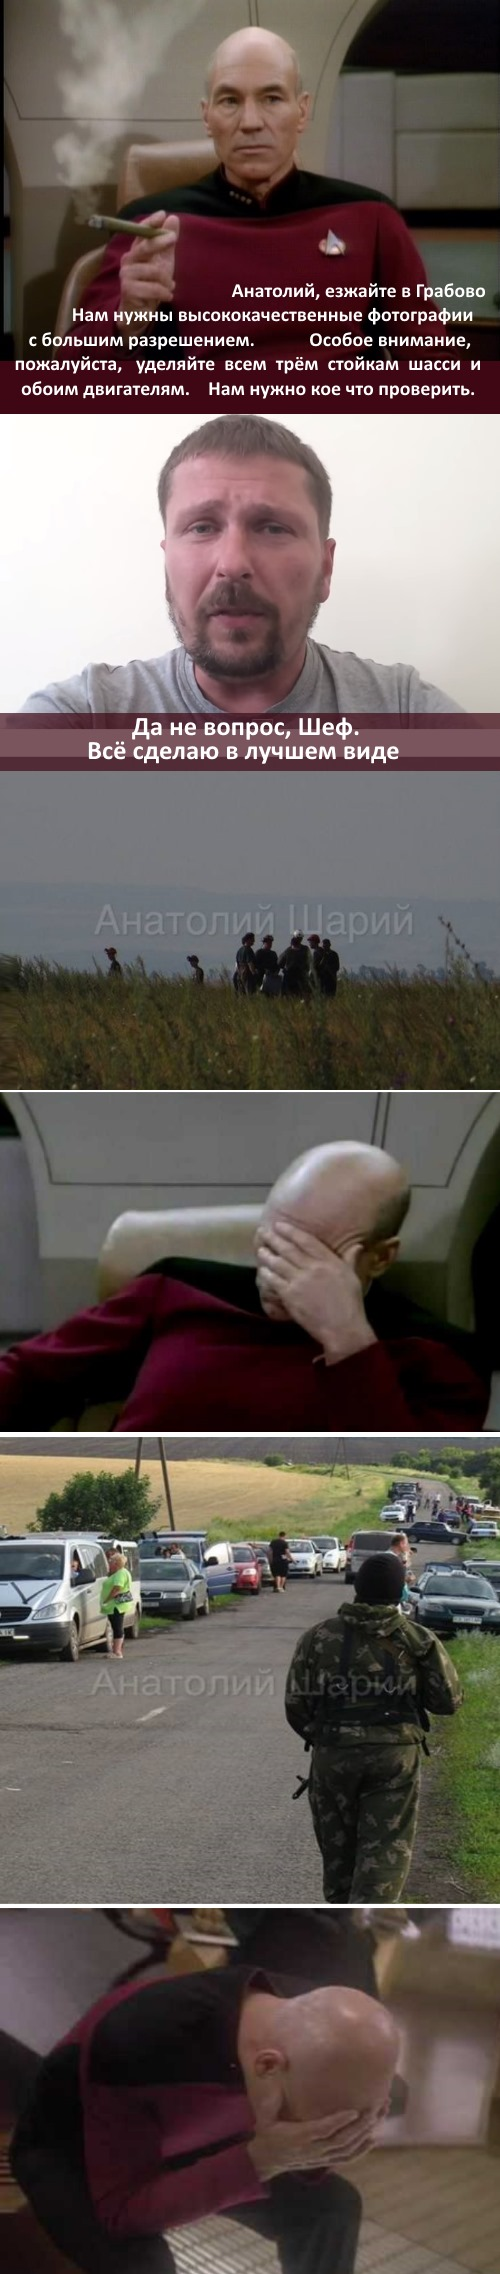 http://images.vfl.ru/ii/1410729172/aab12ec9/6334873.jpg